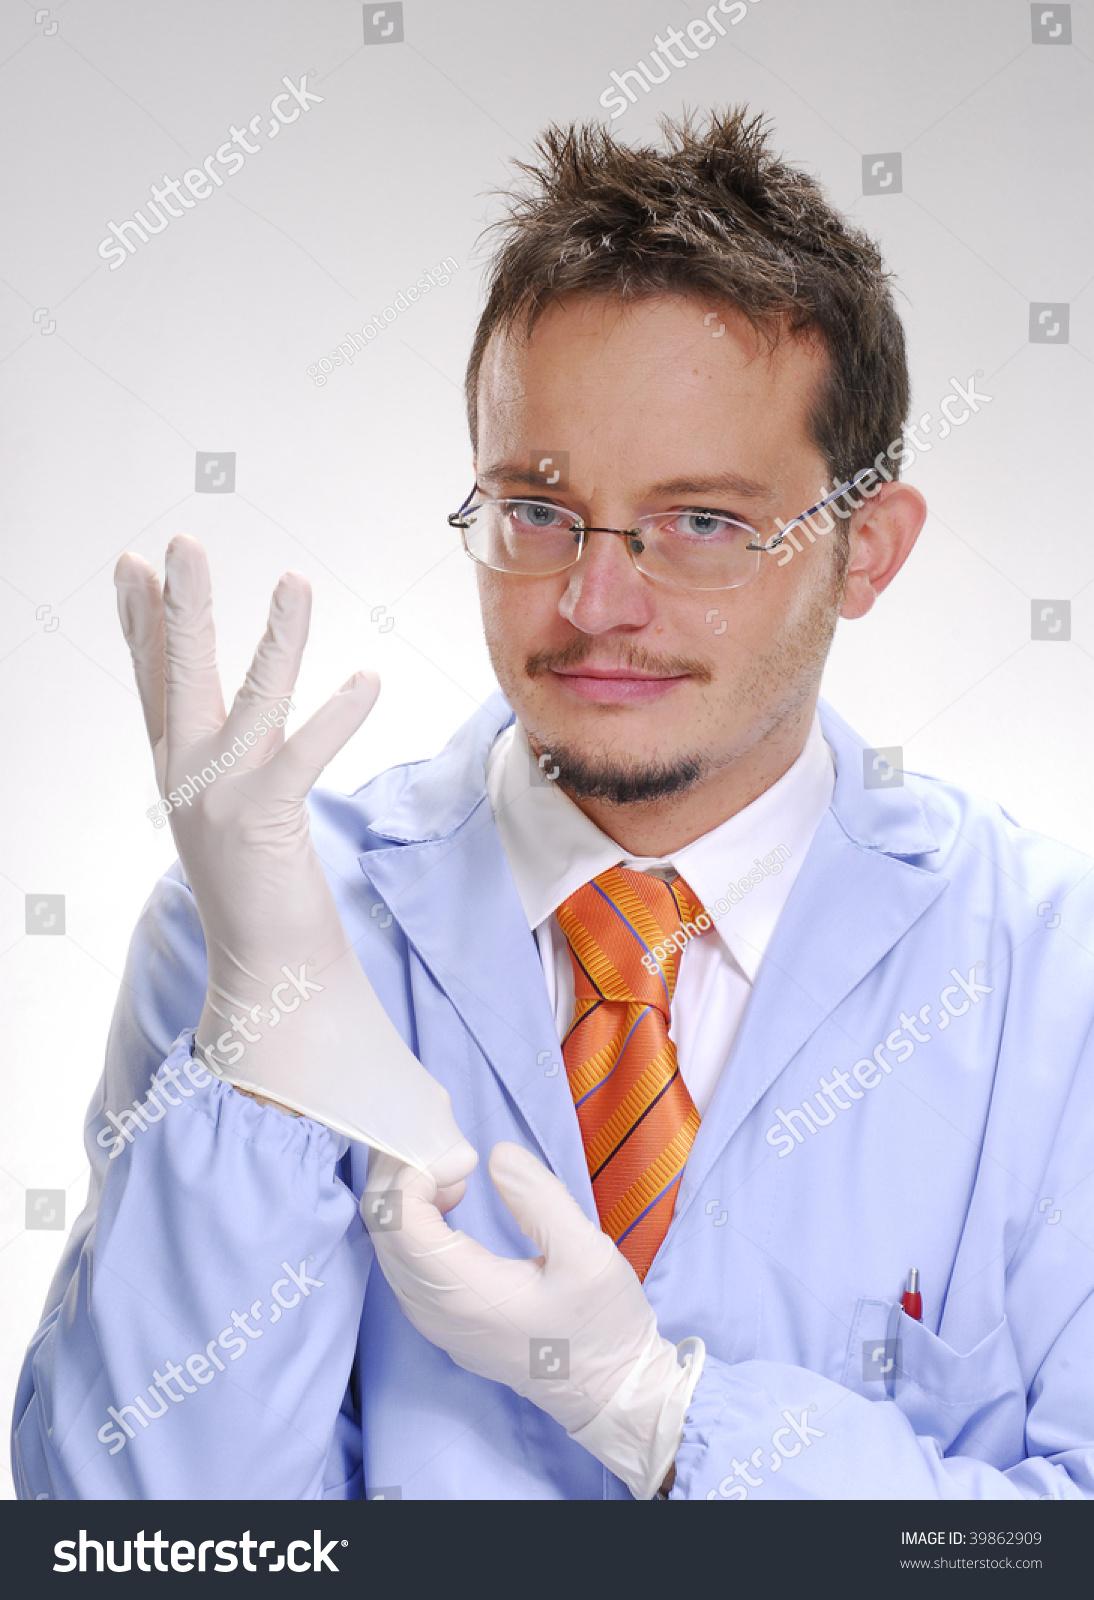 Doctor Latex Gloves 113